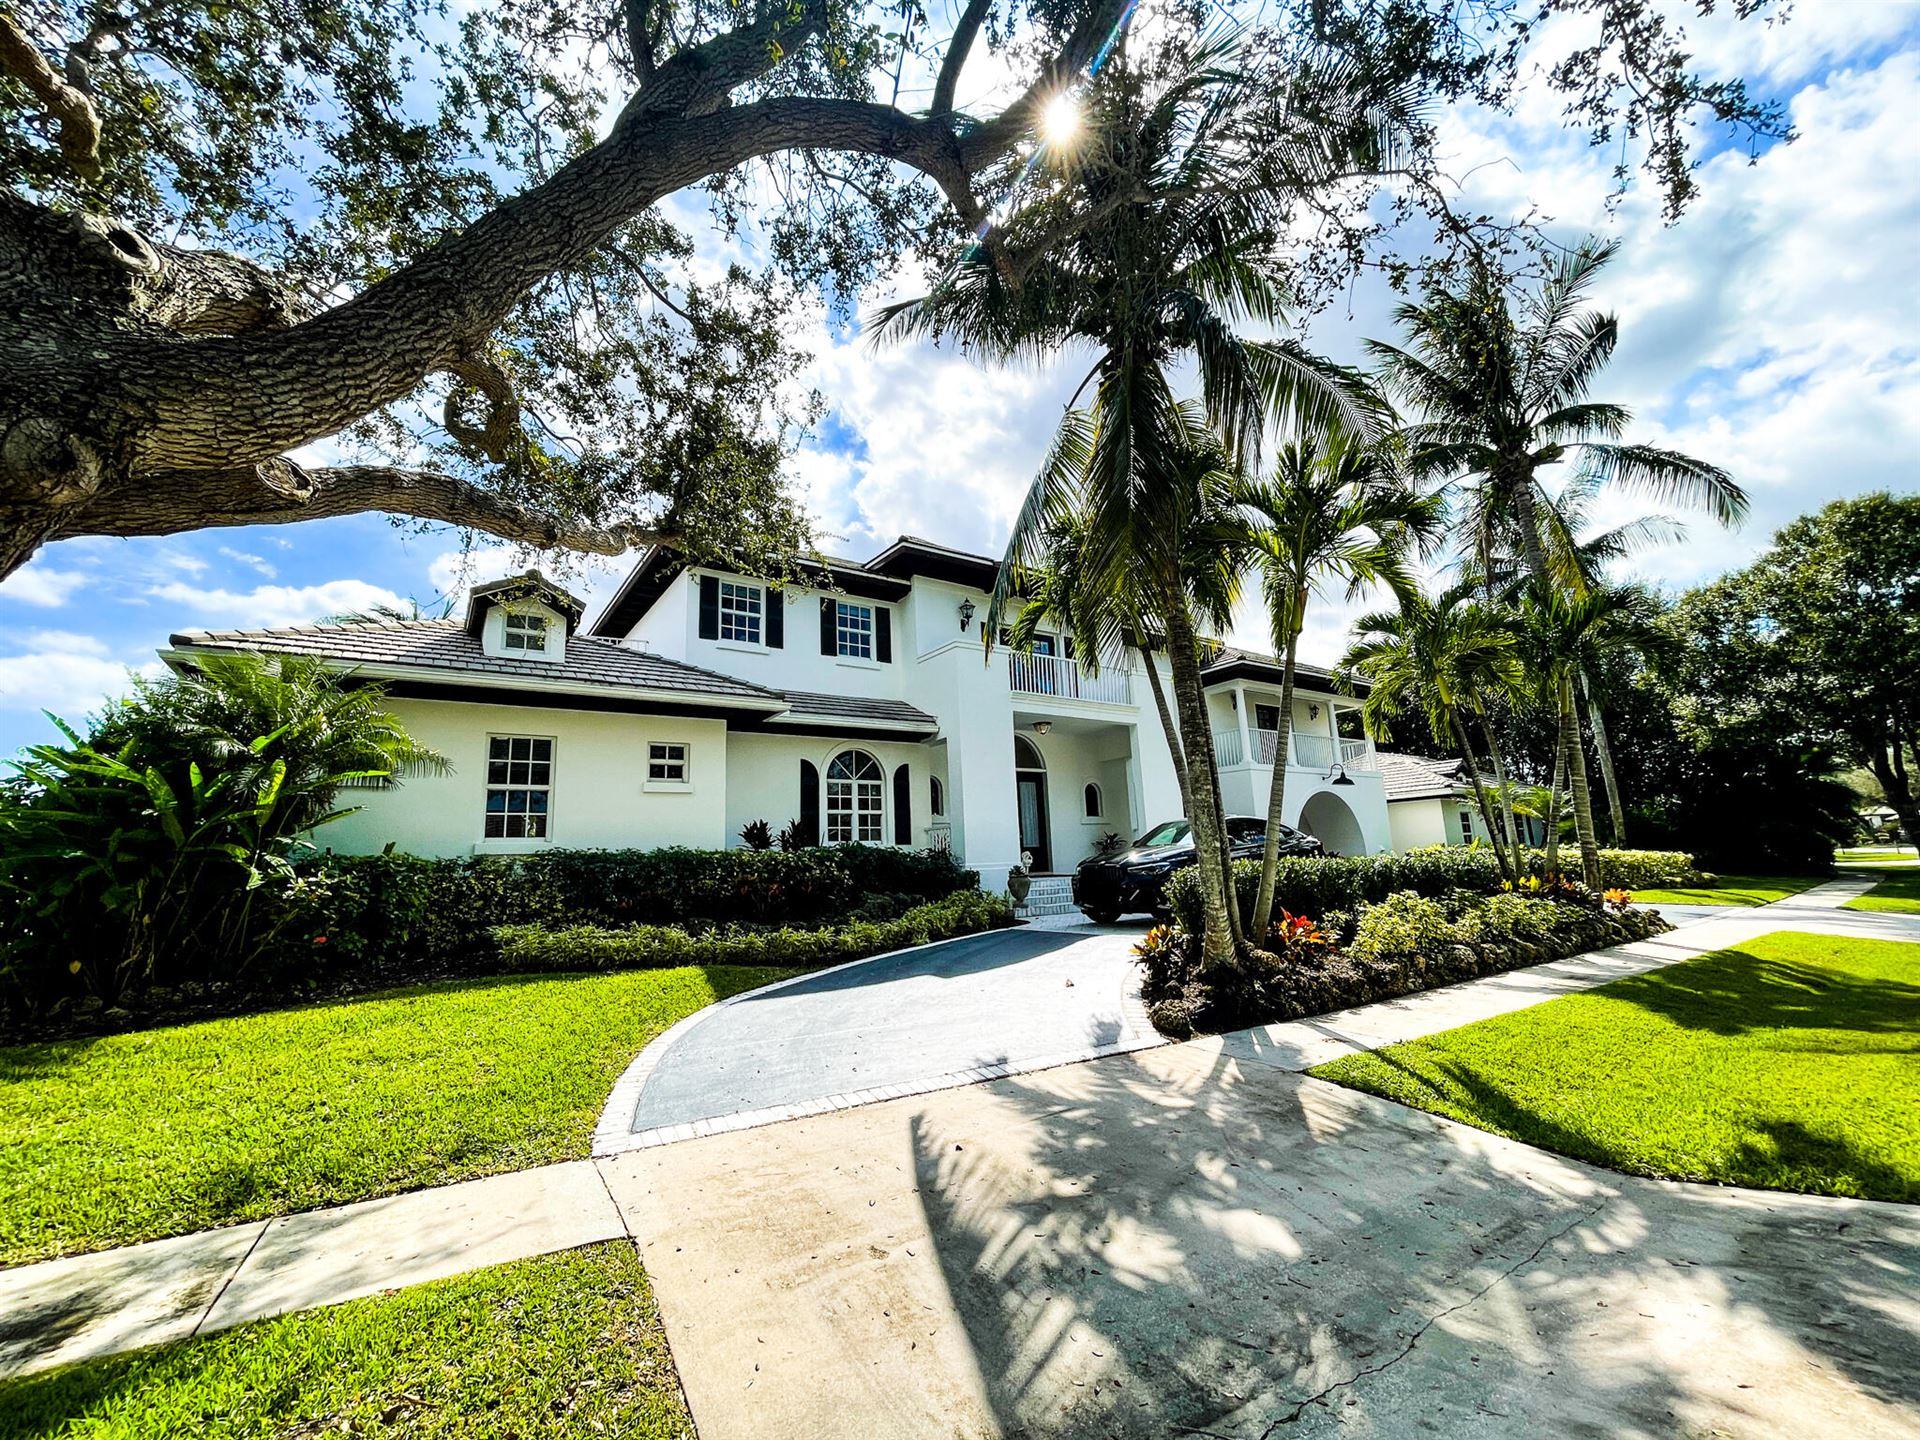 2 Firestone Circle, West Palm Beach, FL 33401 - MLS#: RX-10725421